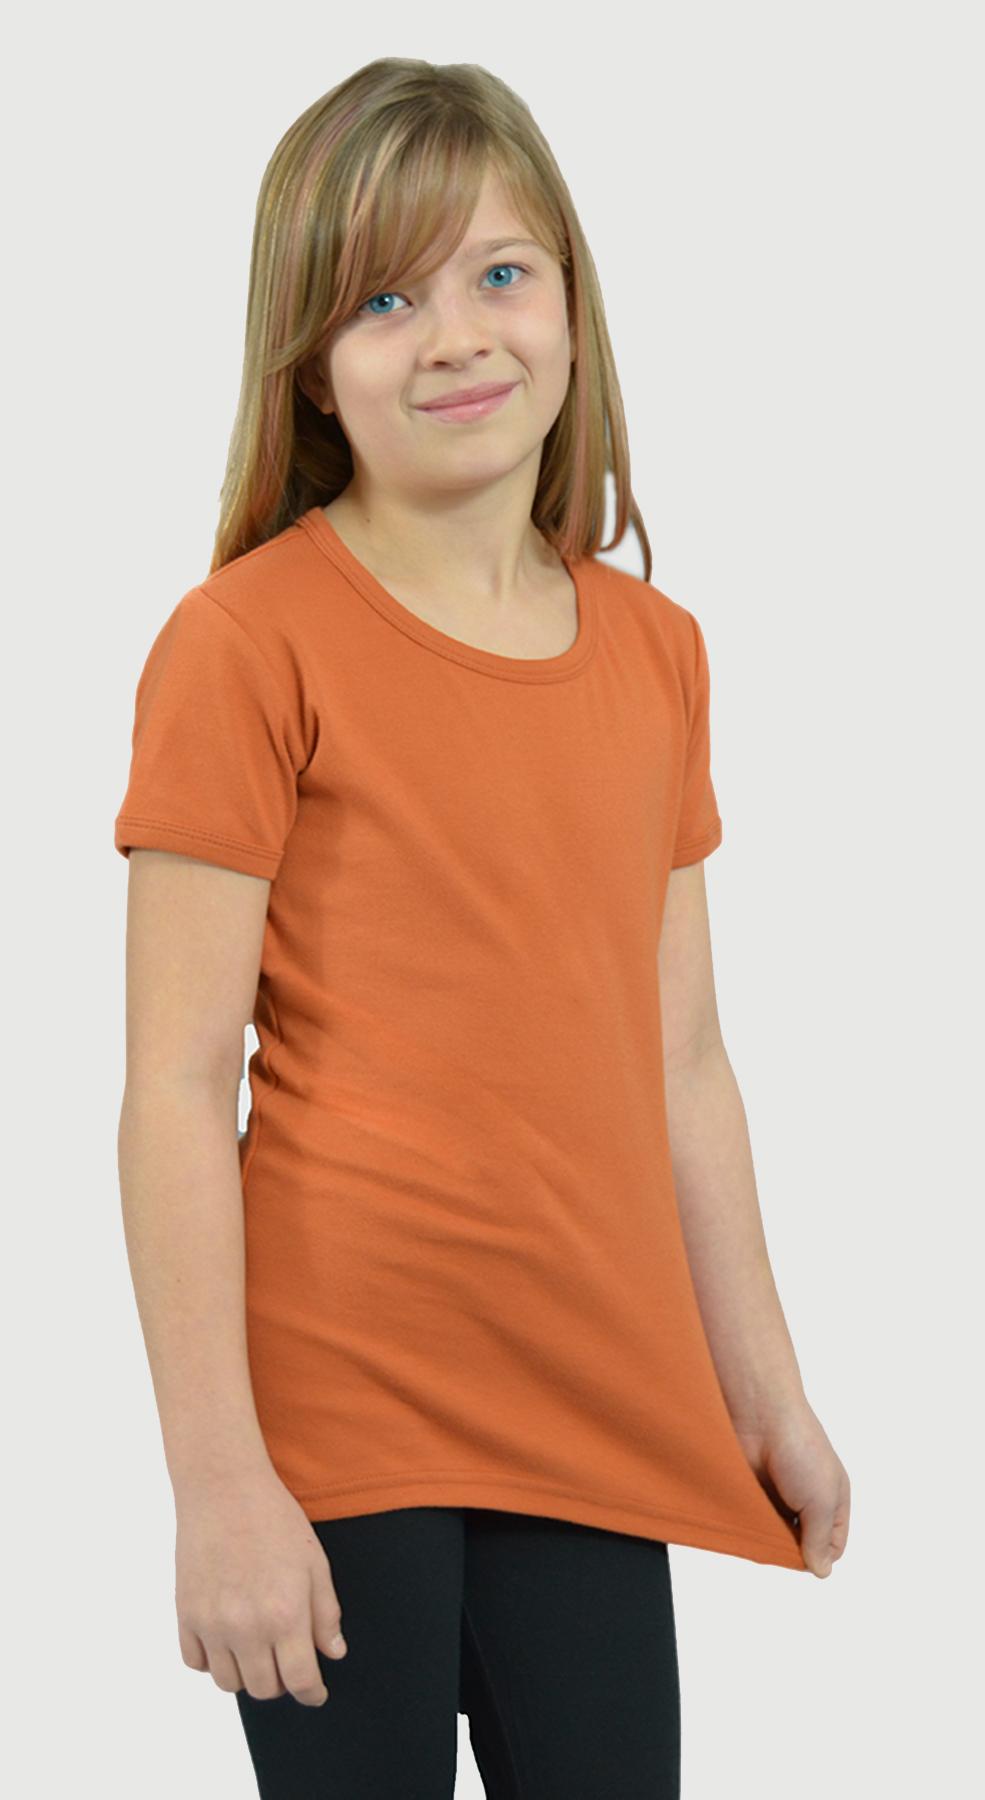 Monag 400010 - Interlock Short Sleeve Girly Tee